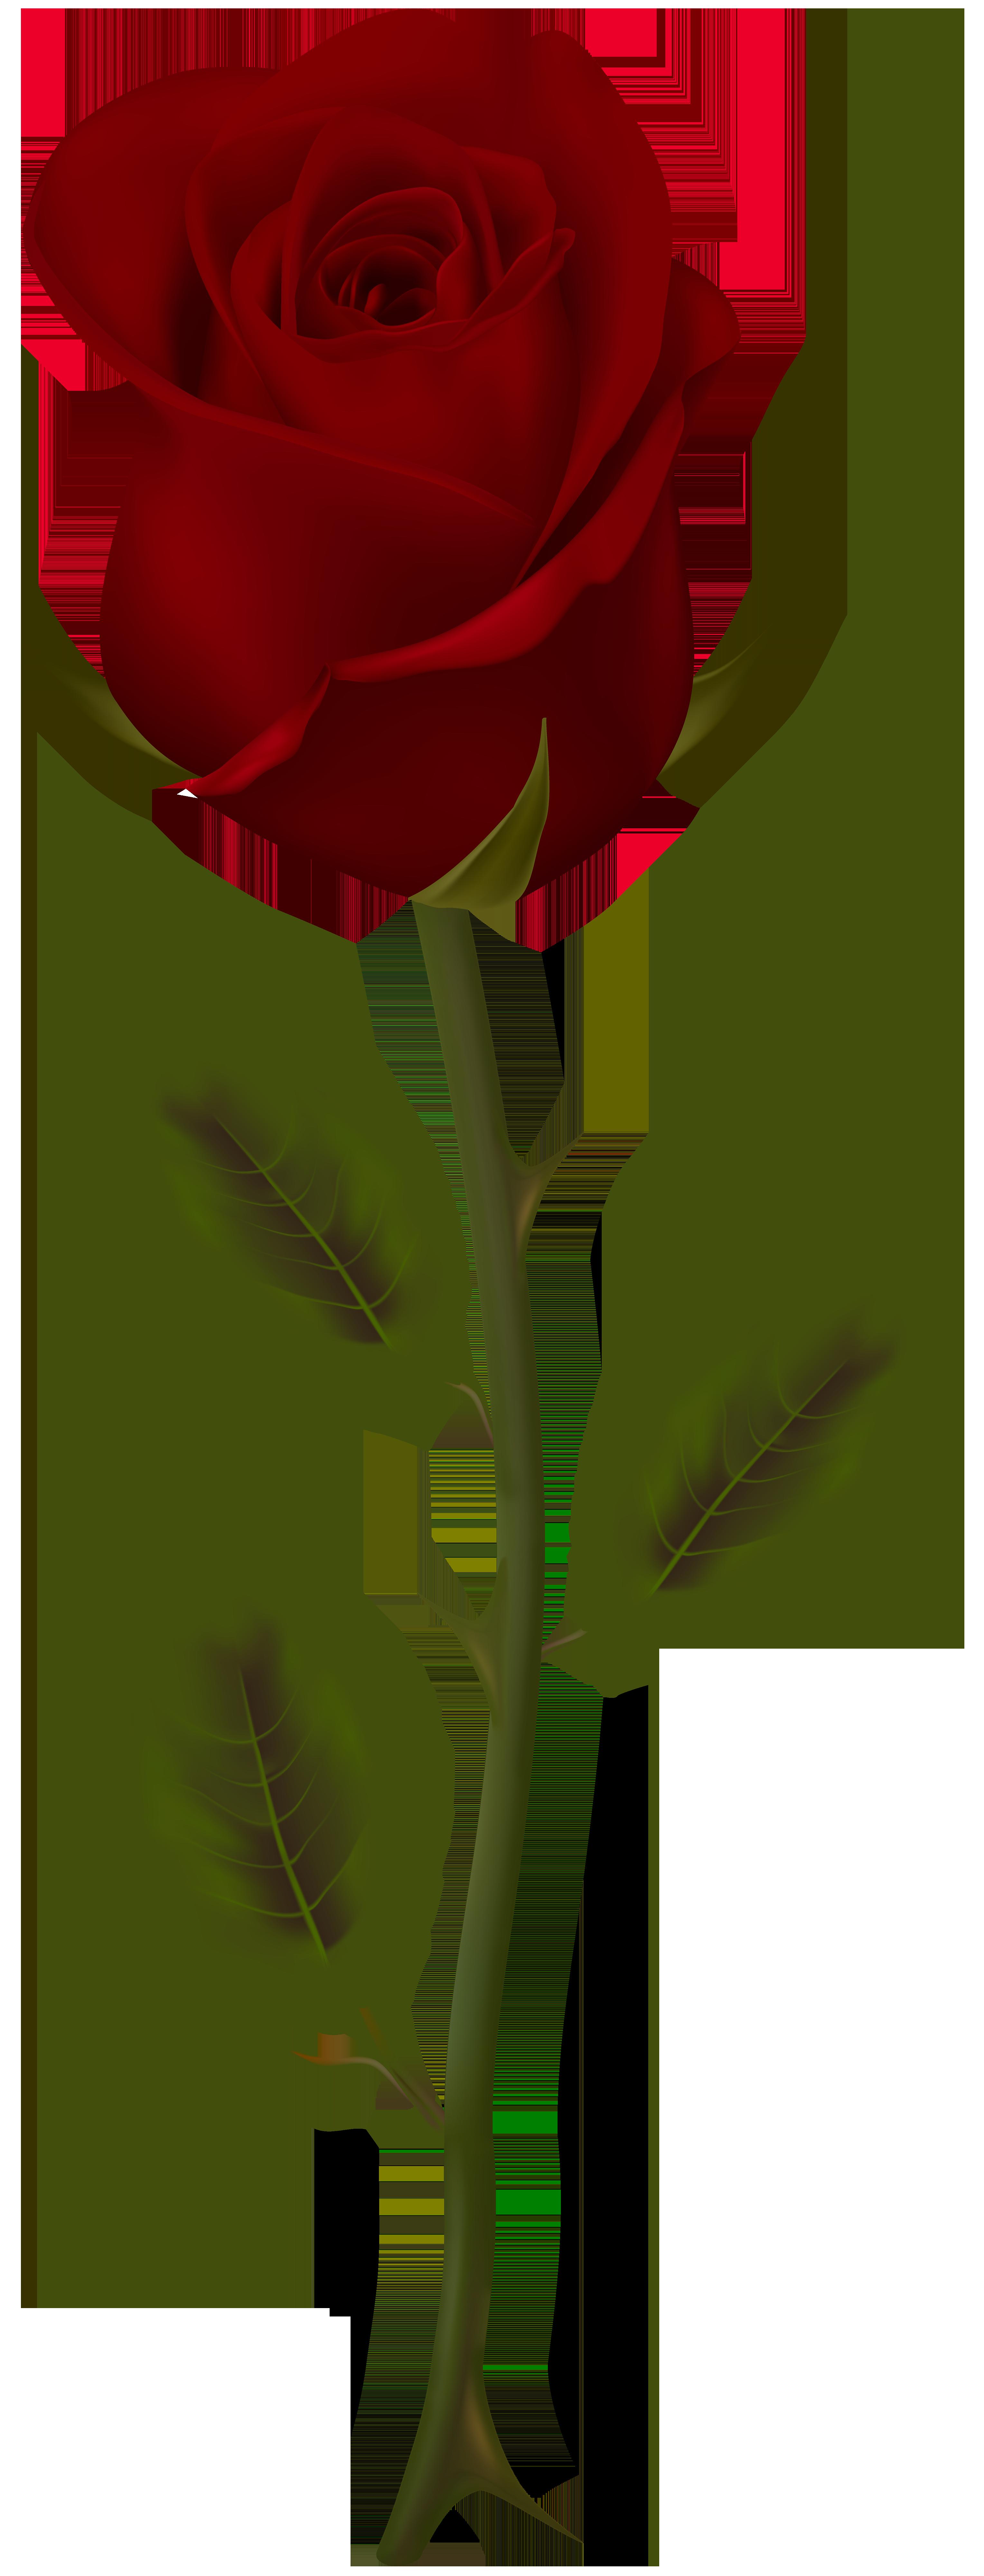 3057x8000 Dark Red Rose Transparent Png Clip Artu200b Gallery Yopriceville